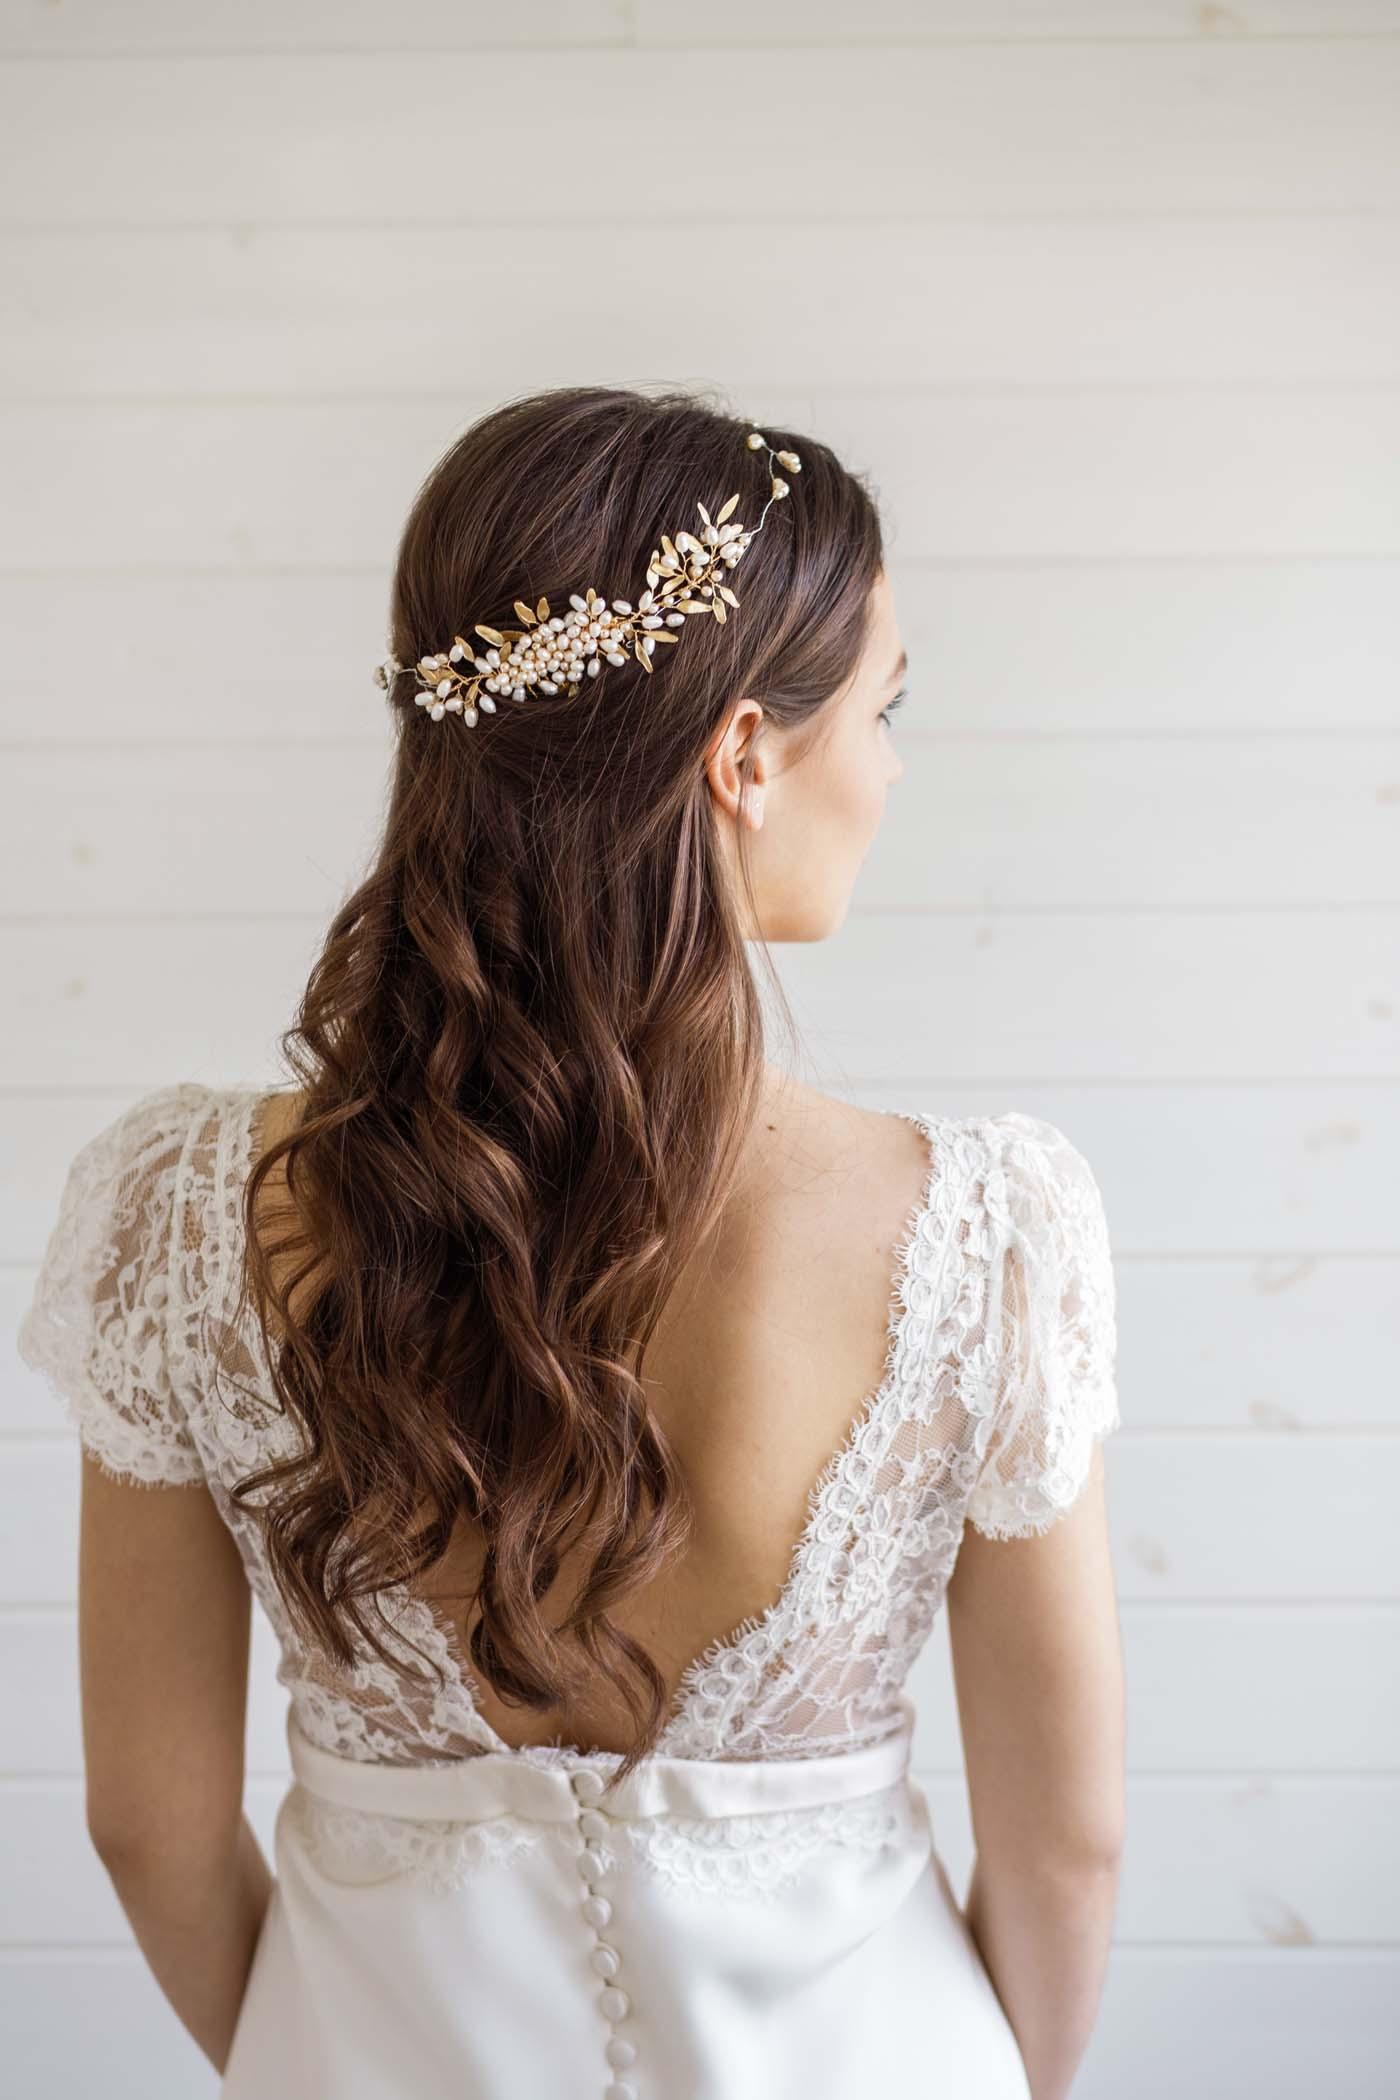 Hypericum Wedding Hair Vine - Victoria Millesime